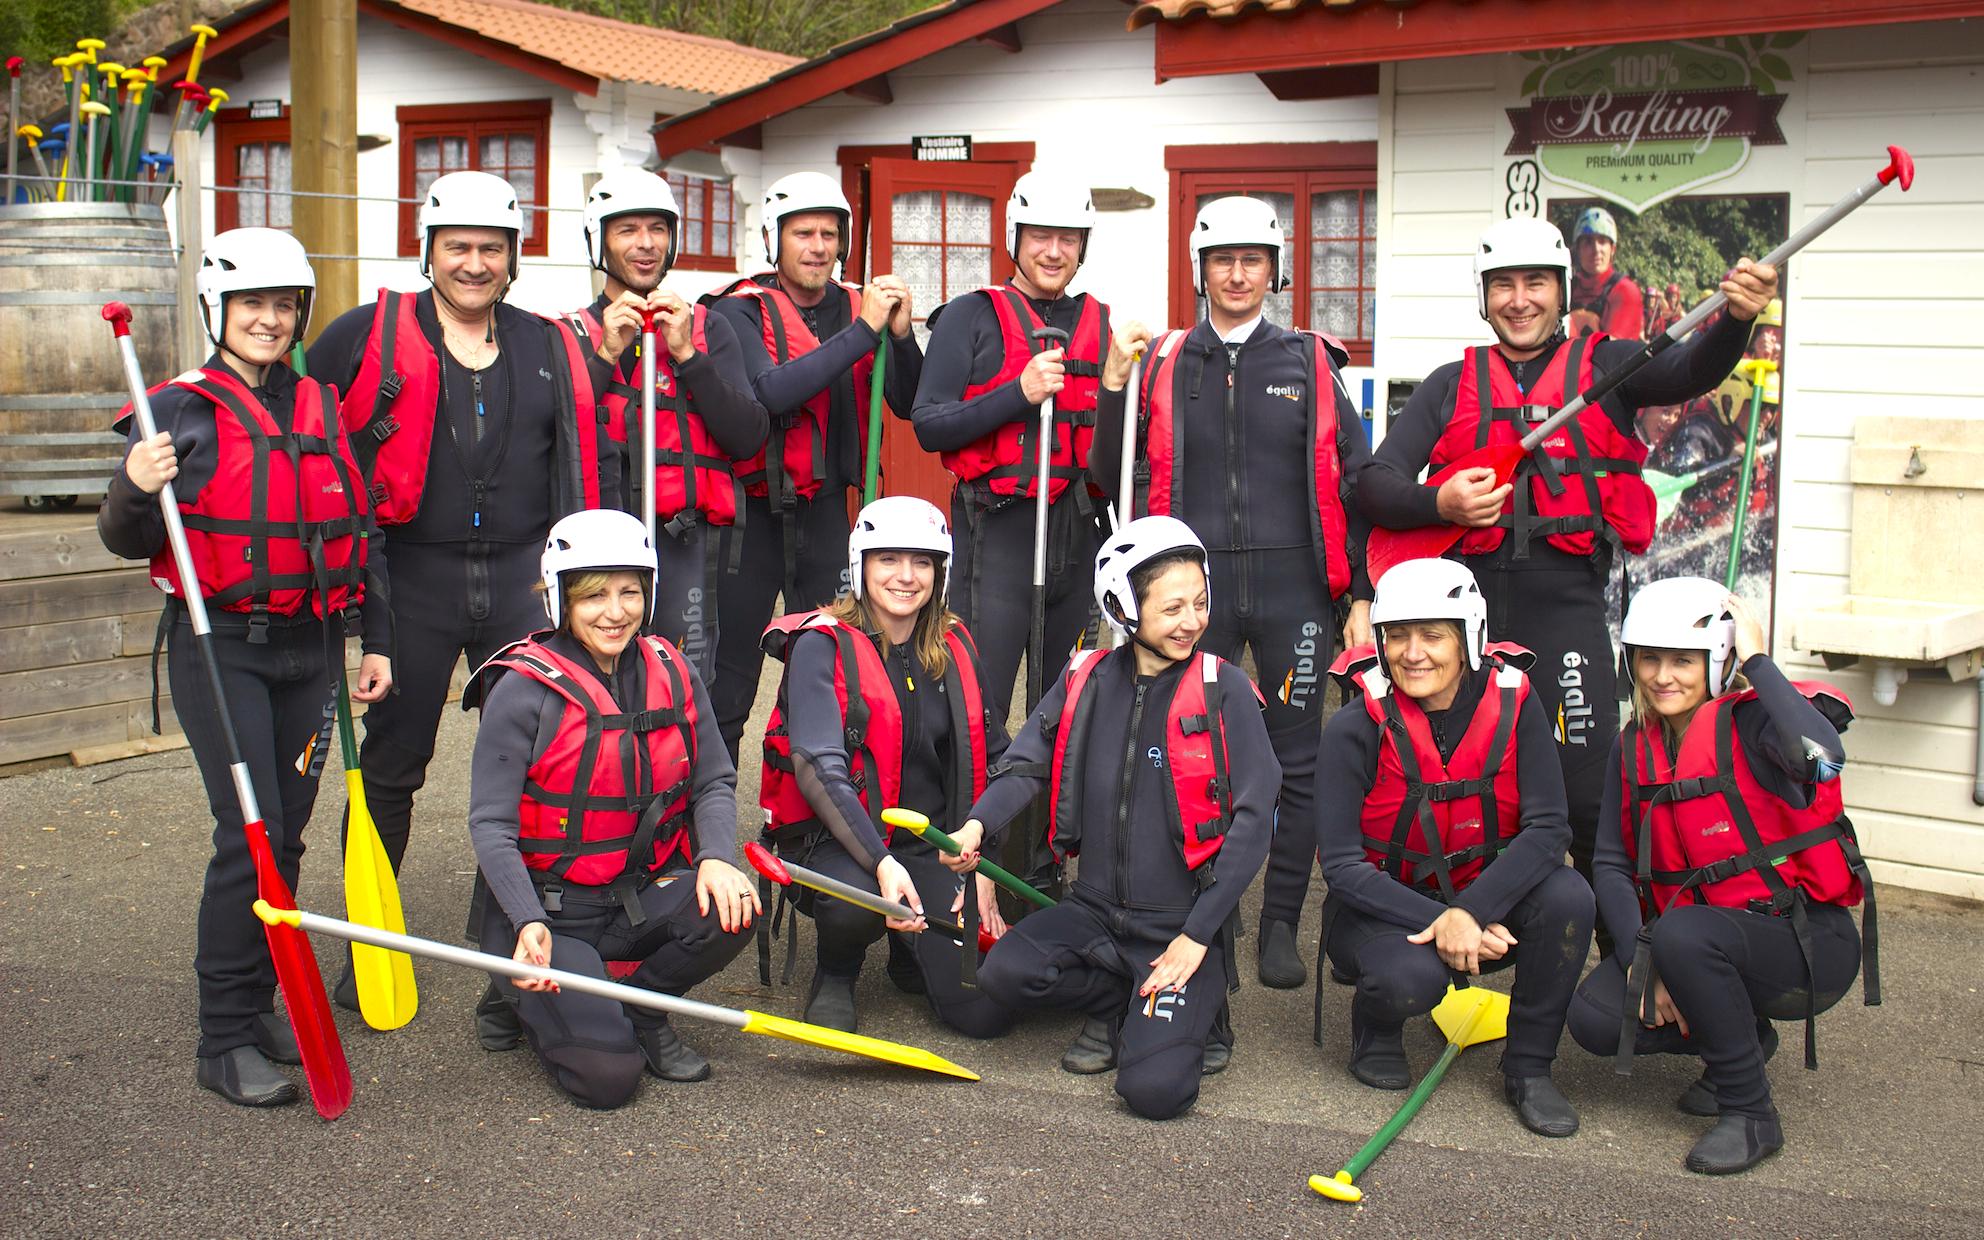 Grand-Hotel-Saint-Jean-de-luz-Incentive-pays-basque-seminaires-rafting-96